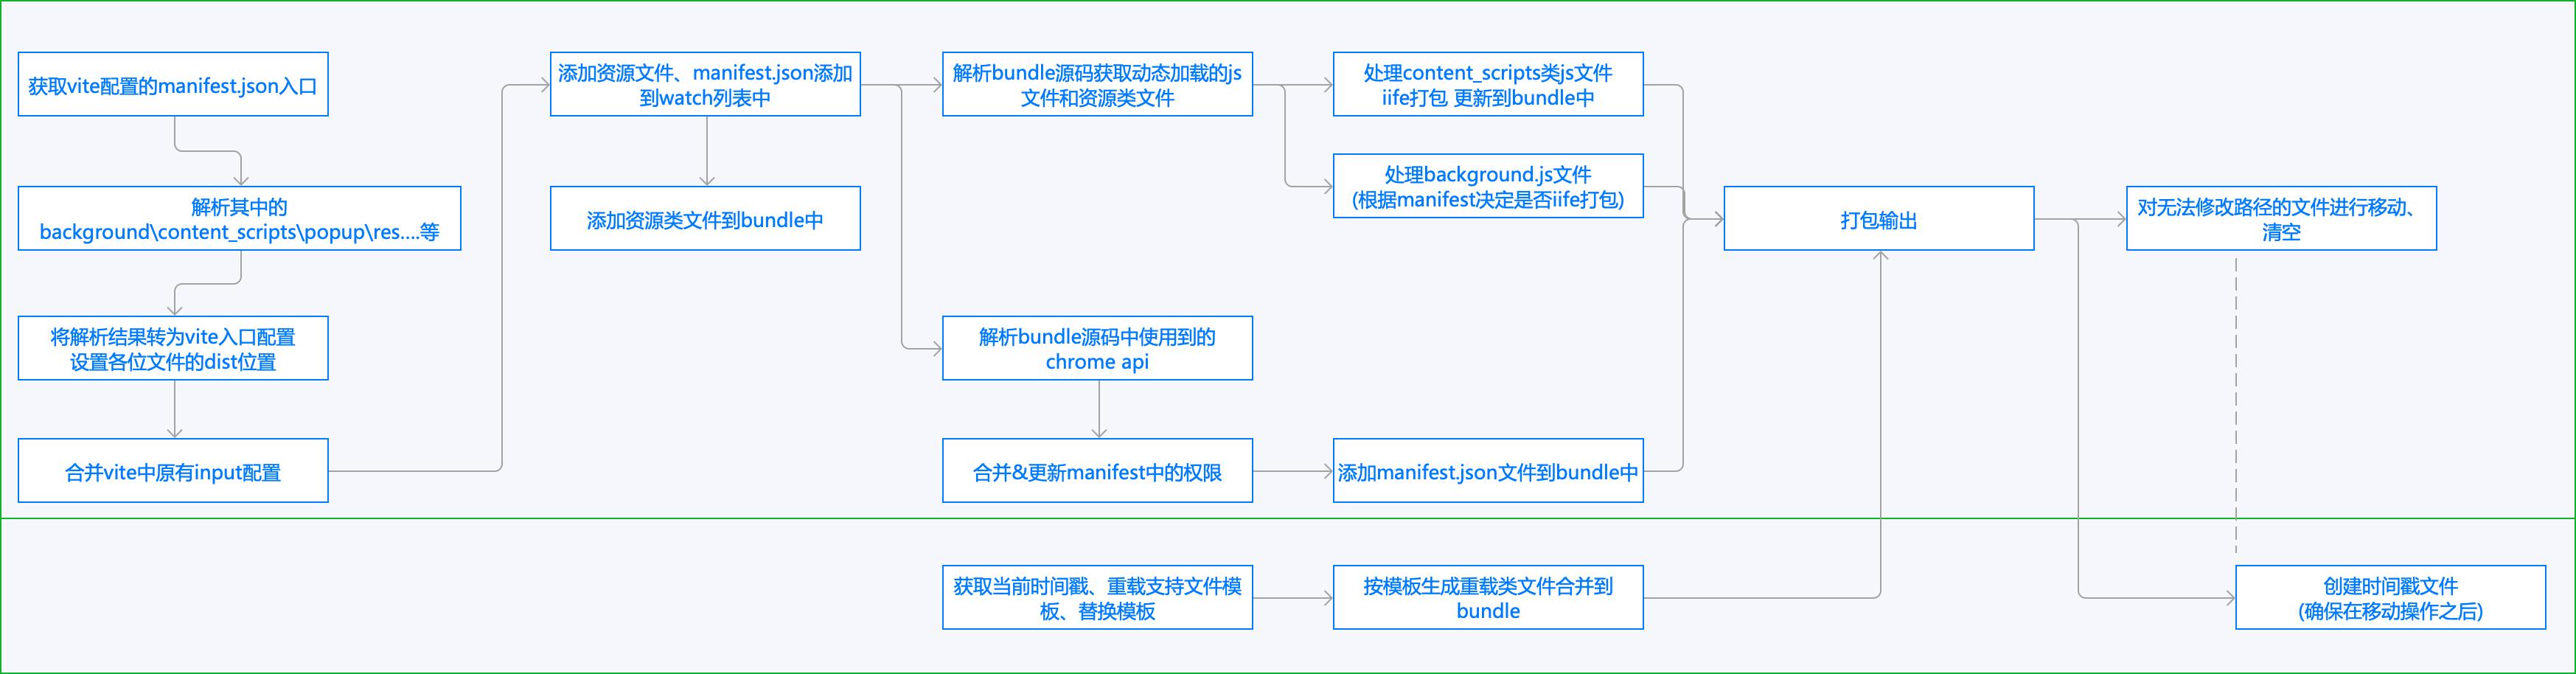 crx3插件逻辑示意图